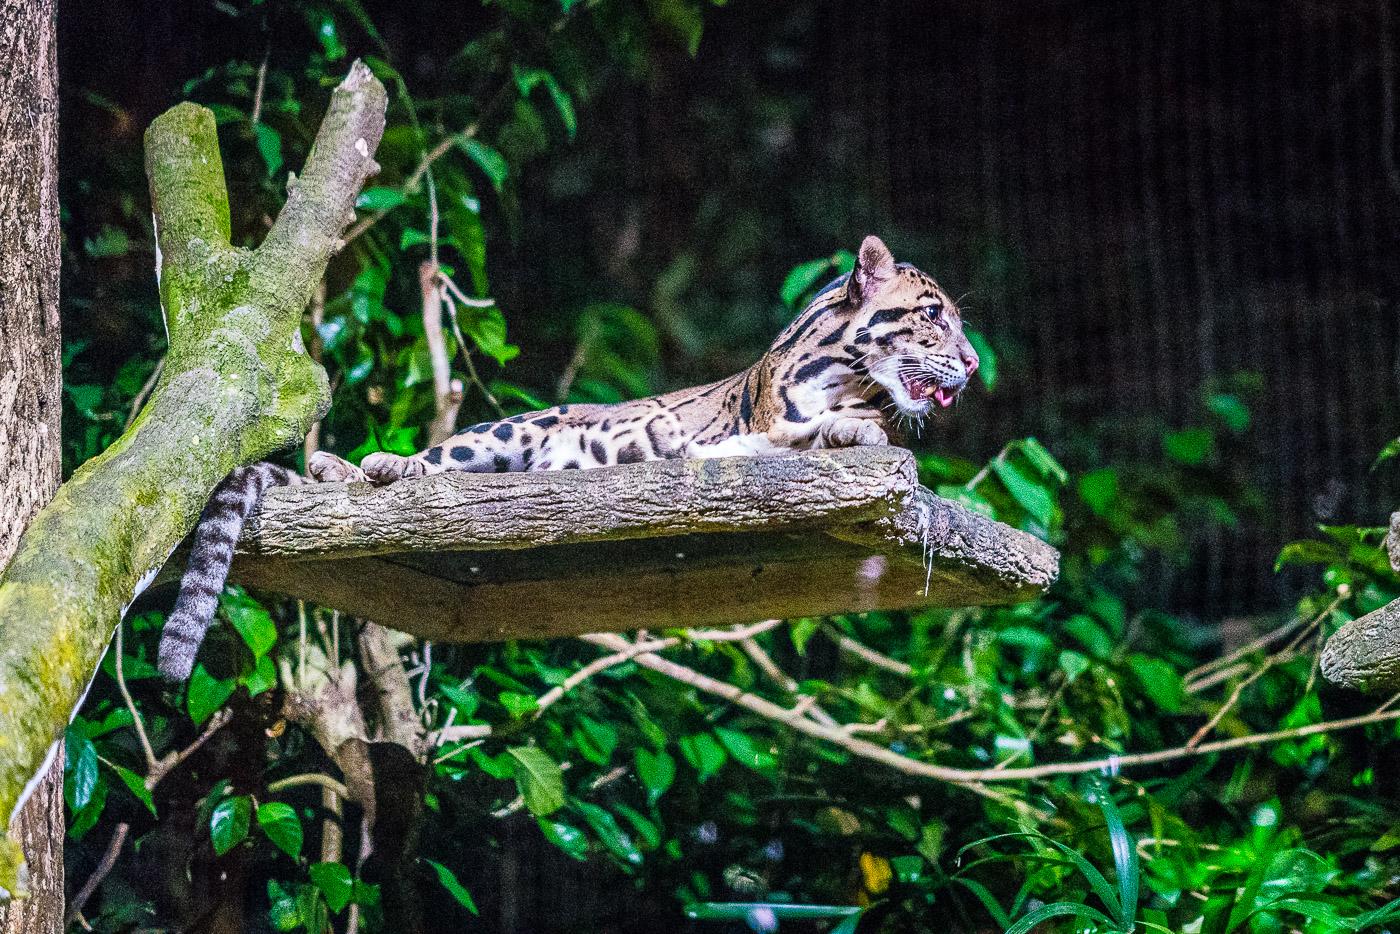 Ocelot resting at the night safari